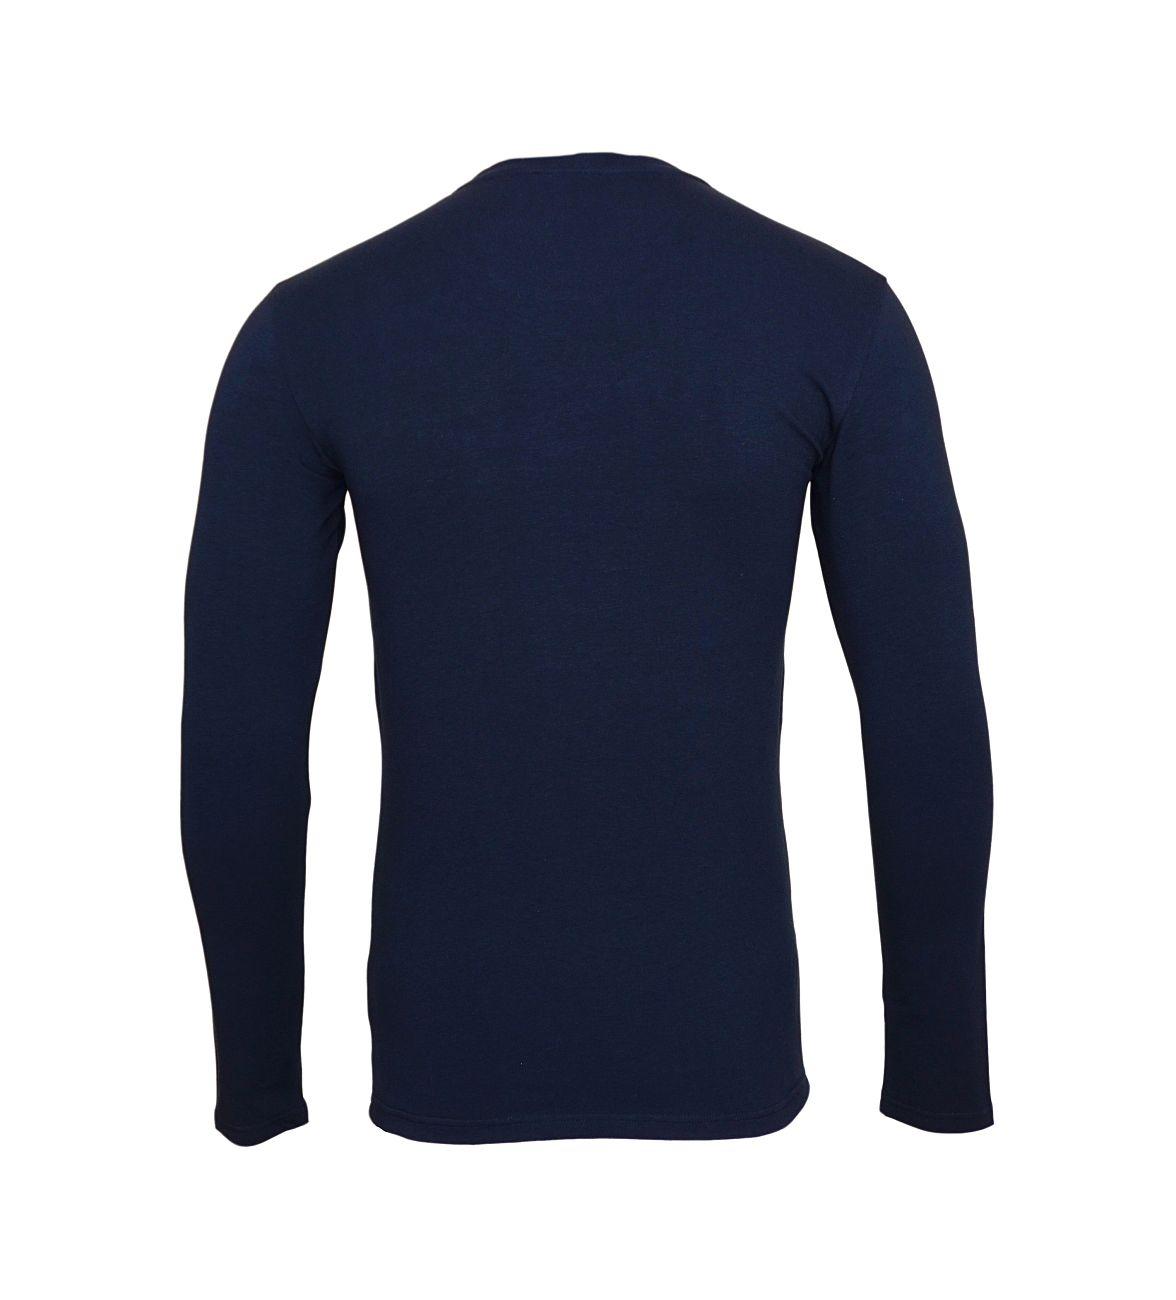 Emporio Armani Longsleeve Rundhals Shirt 111023 8A512 00135 MARINE WX18-EAL